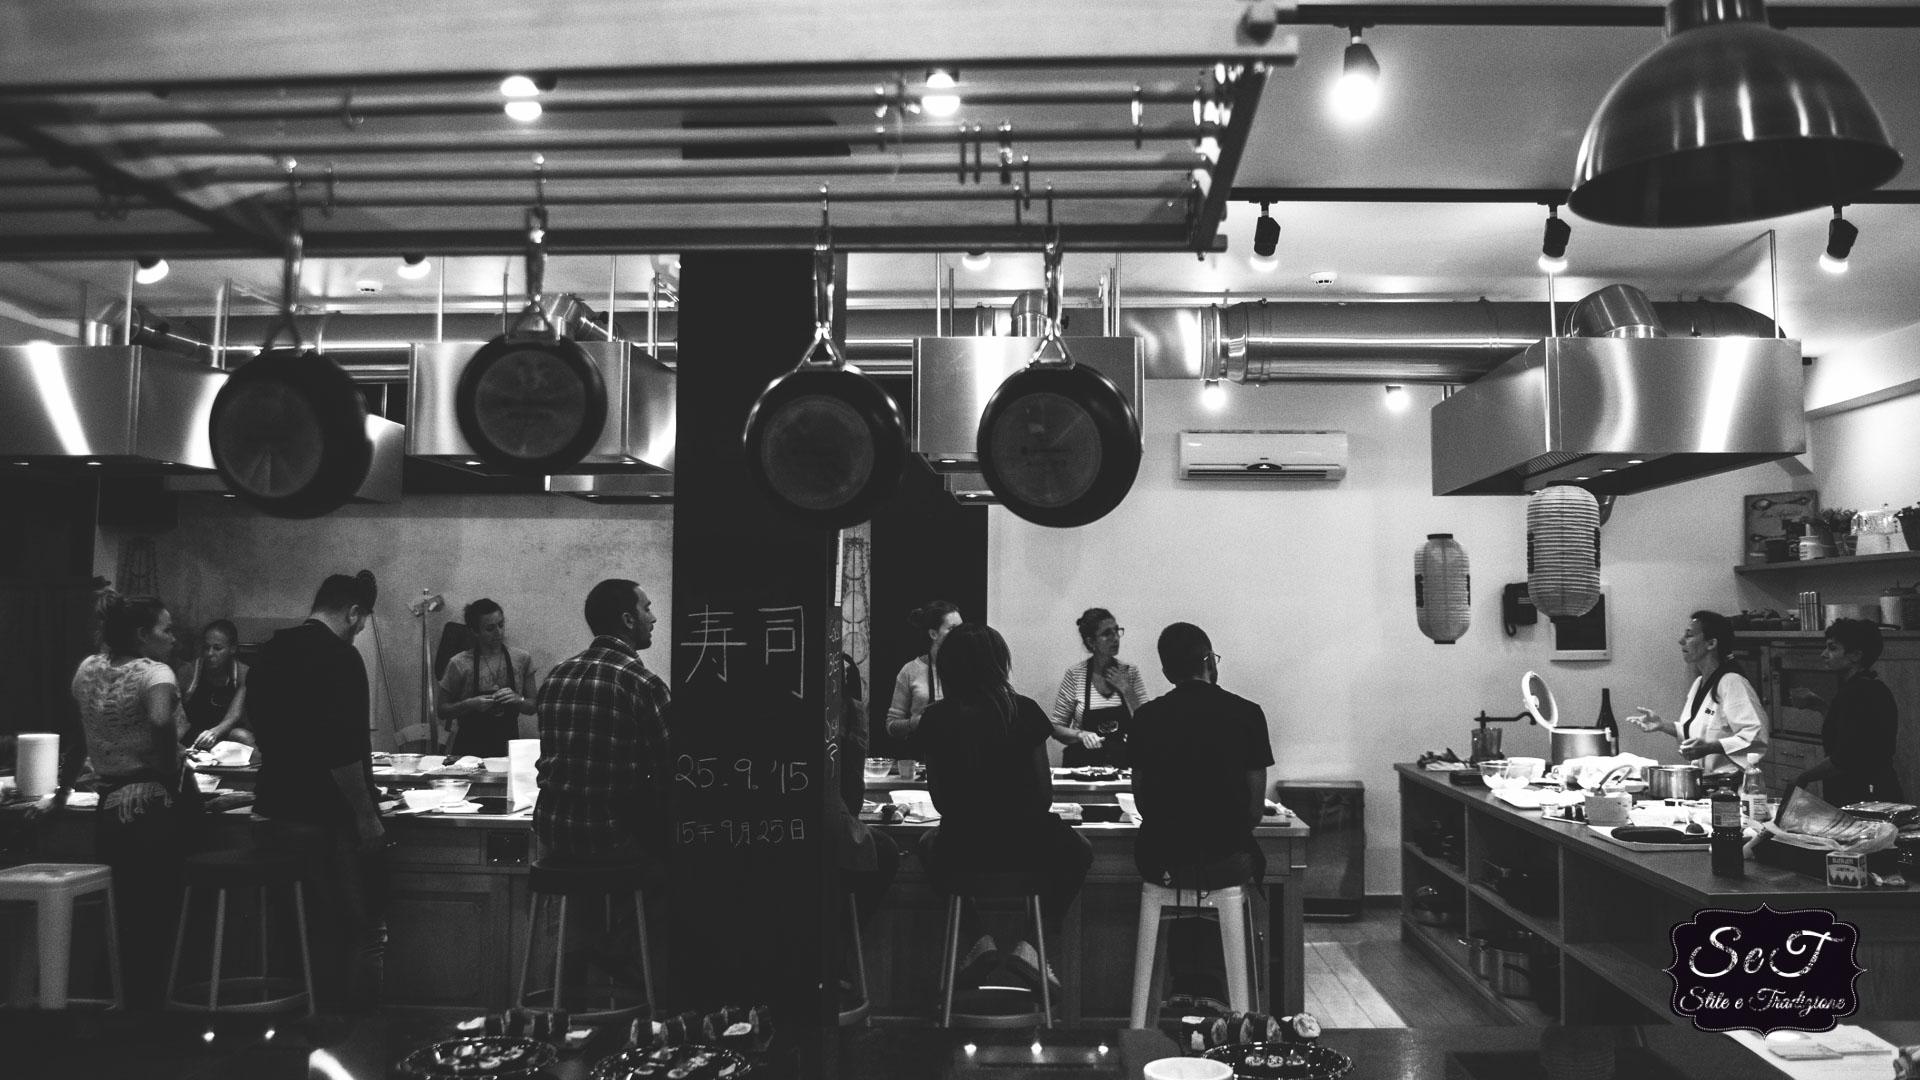 Corso di Cucina Vegan – Primi passi verso una cucina etica